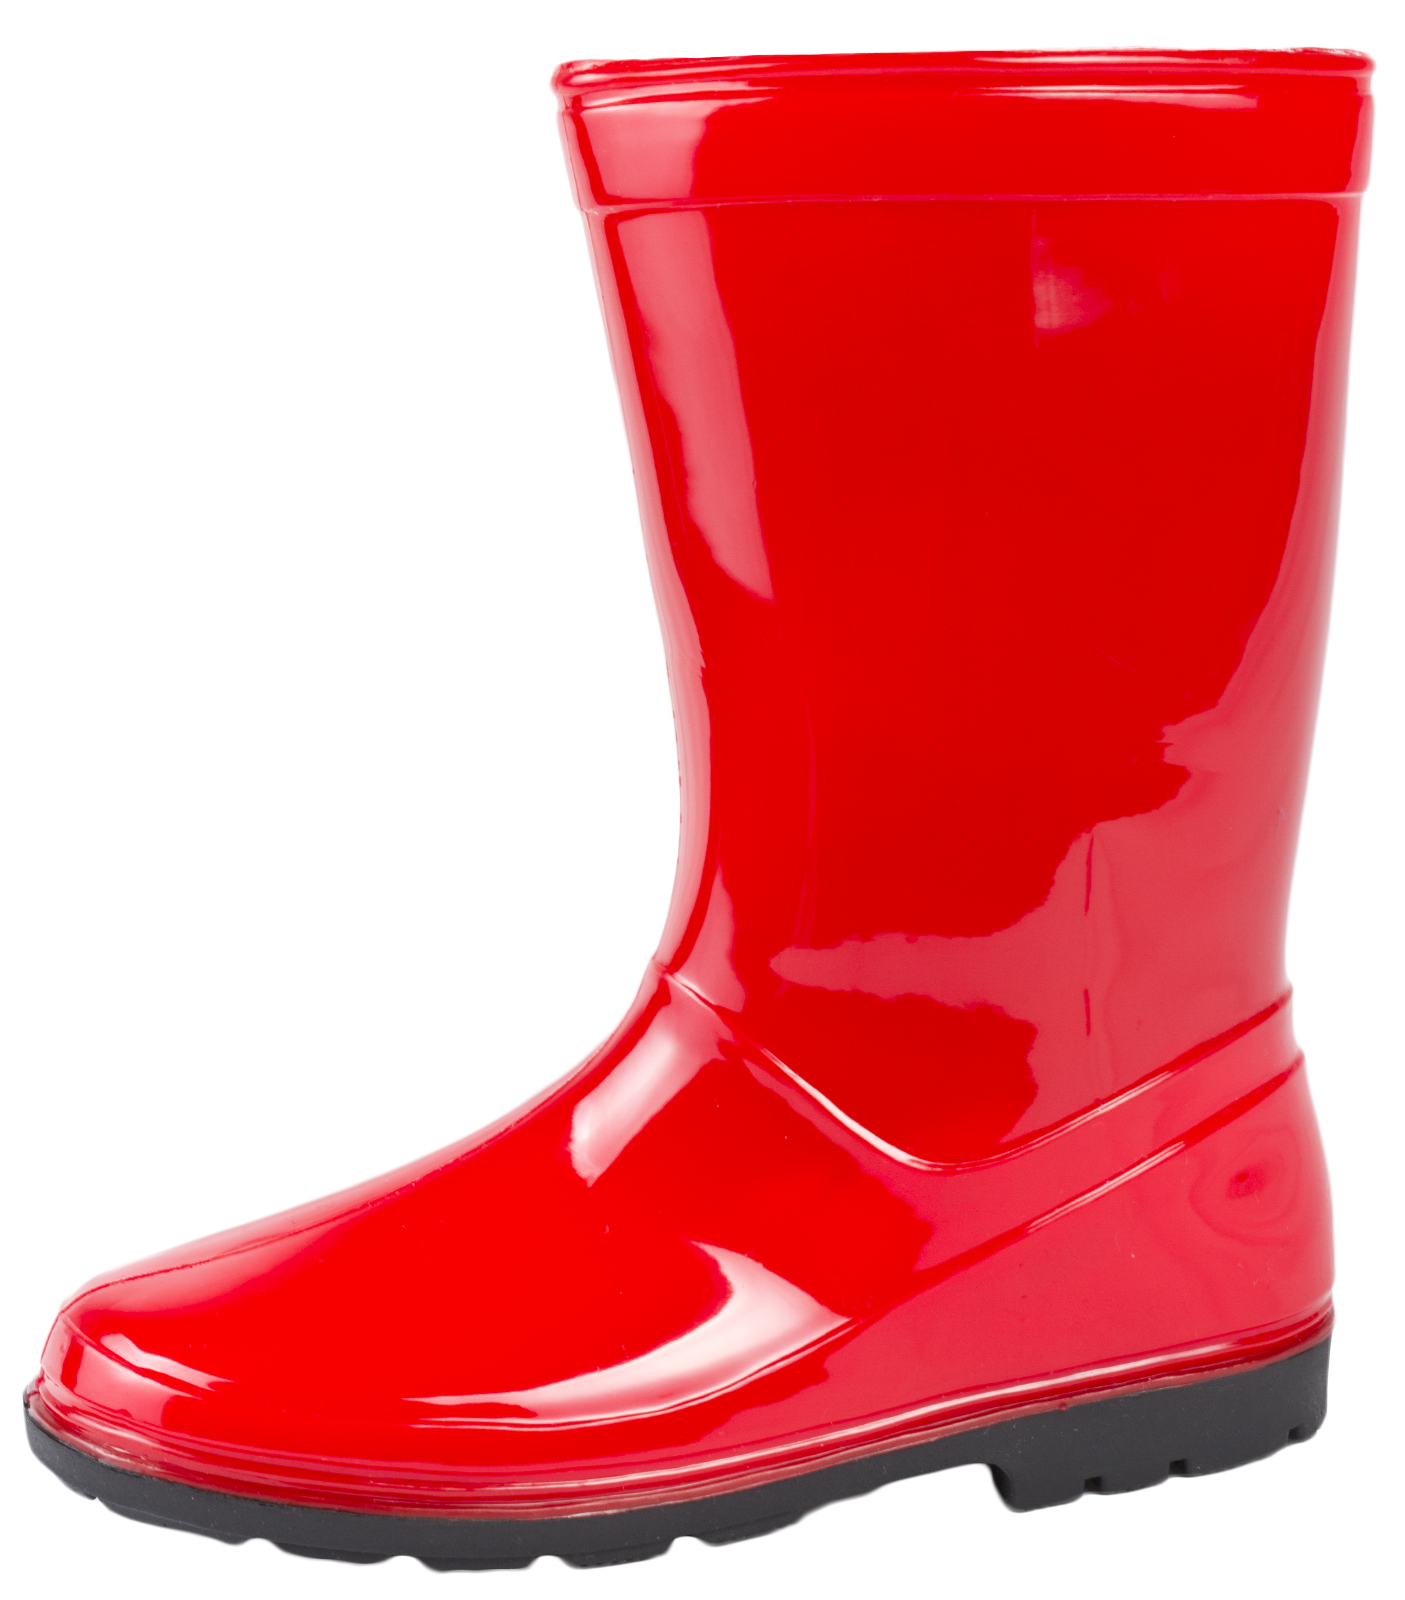 New Childrens Wellington Boots Snow